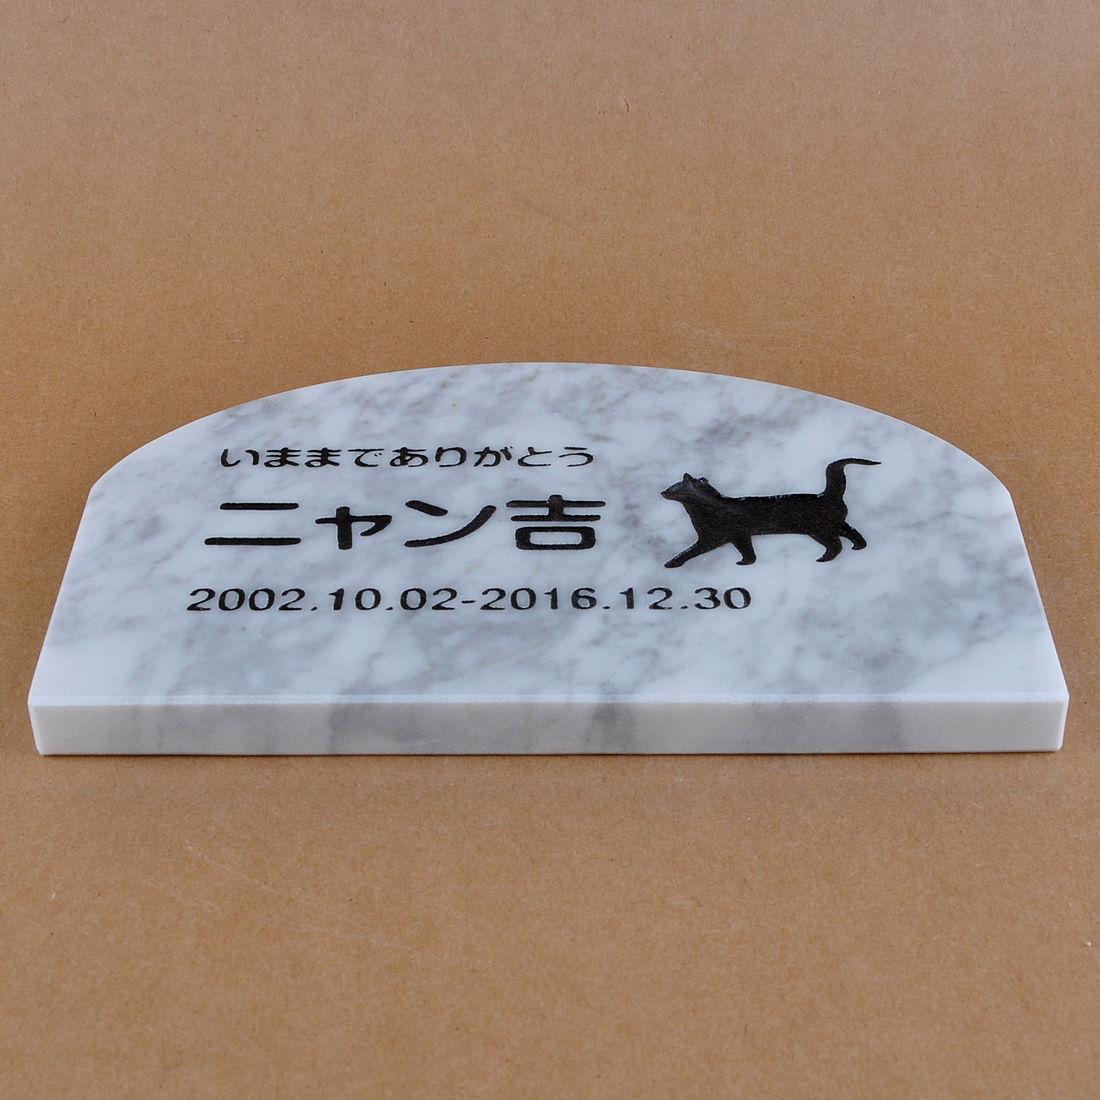 Pet&Love. ペットのお墓 天然石製 シンプル型 大理石 グレースリット アーチ 200x130mm(厚さ20mm)  【HLS_DU】【楽ギフ_名入れ】 attr130attr ctgr2ctgr sml3sml+ctgr2ctgr CAT